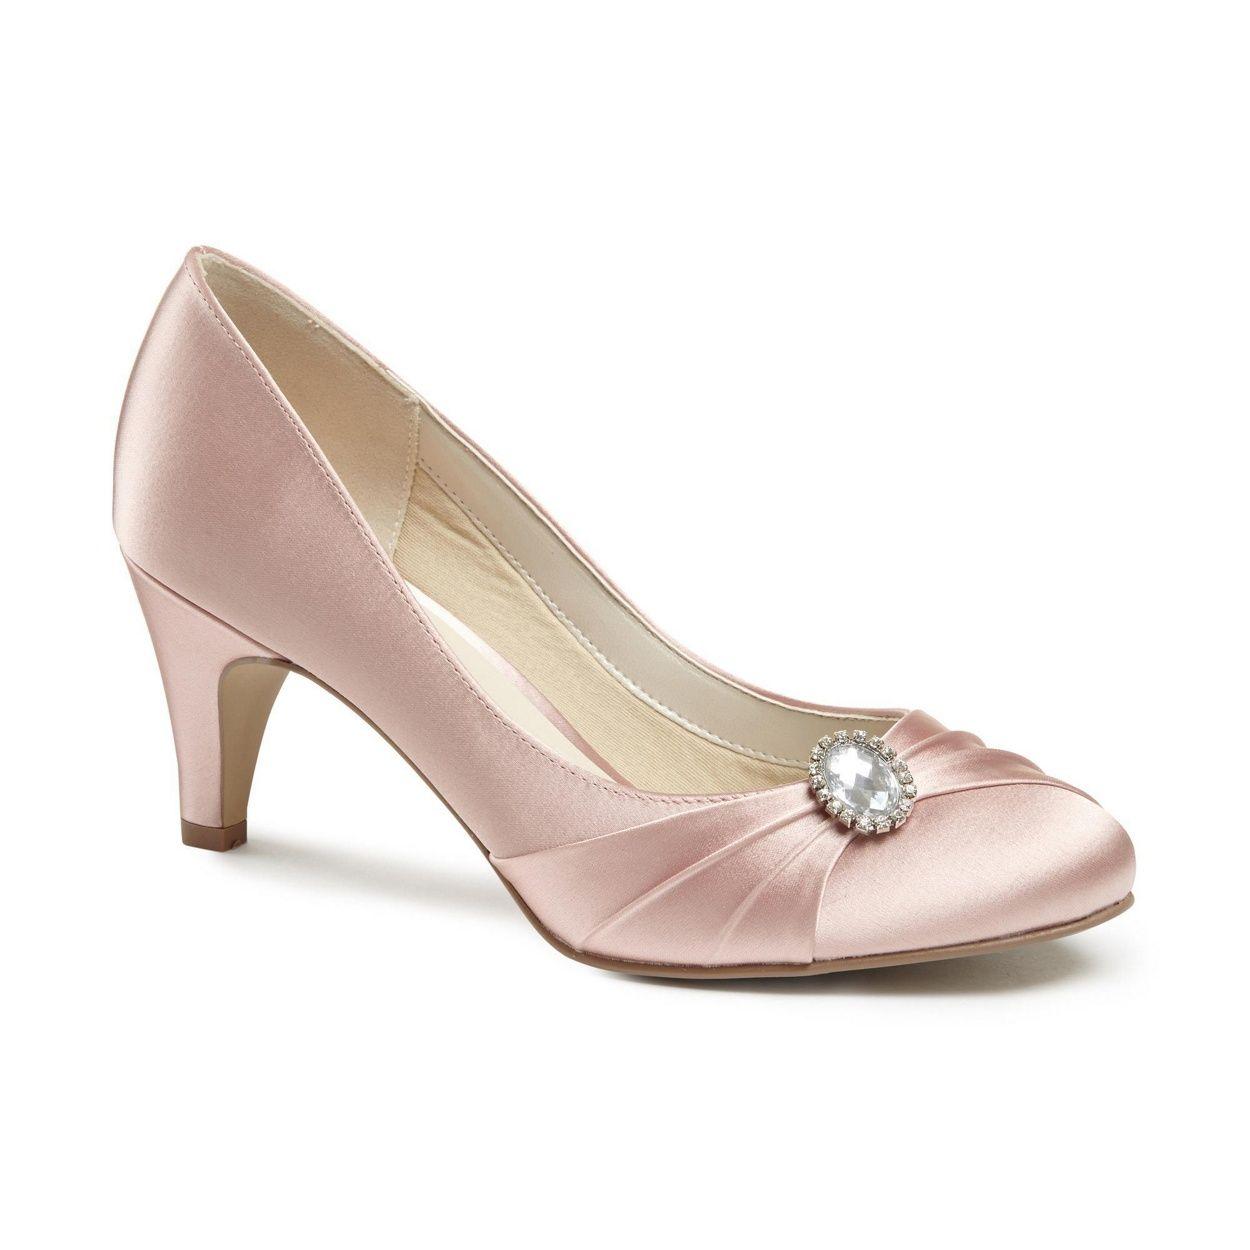 The Stunnig 'Harmony' Round Toe Court Shoe, Set Off With